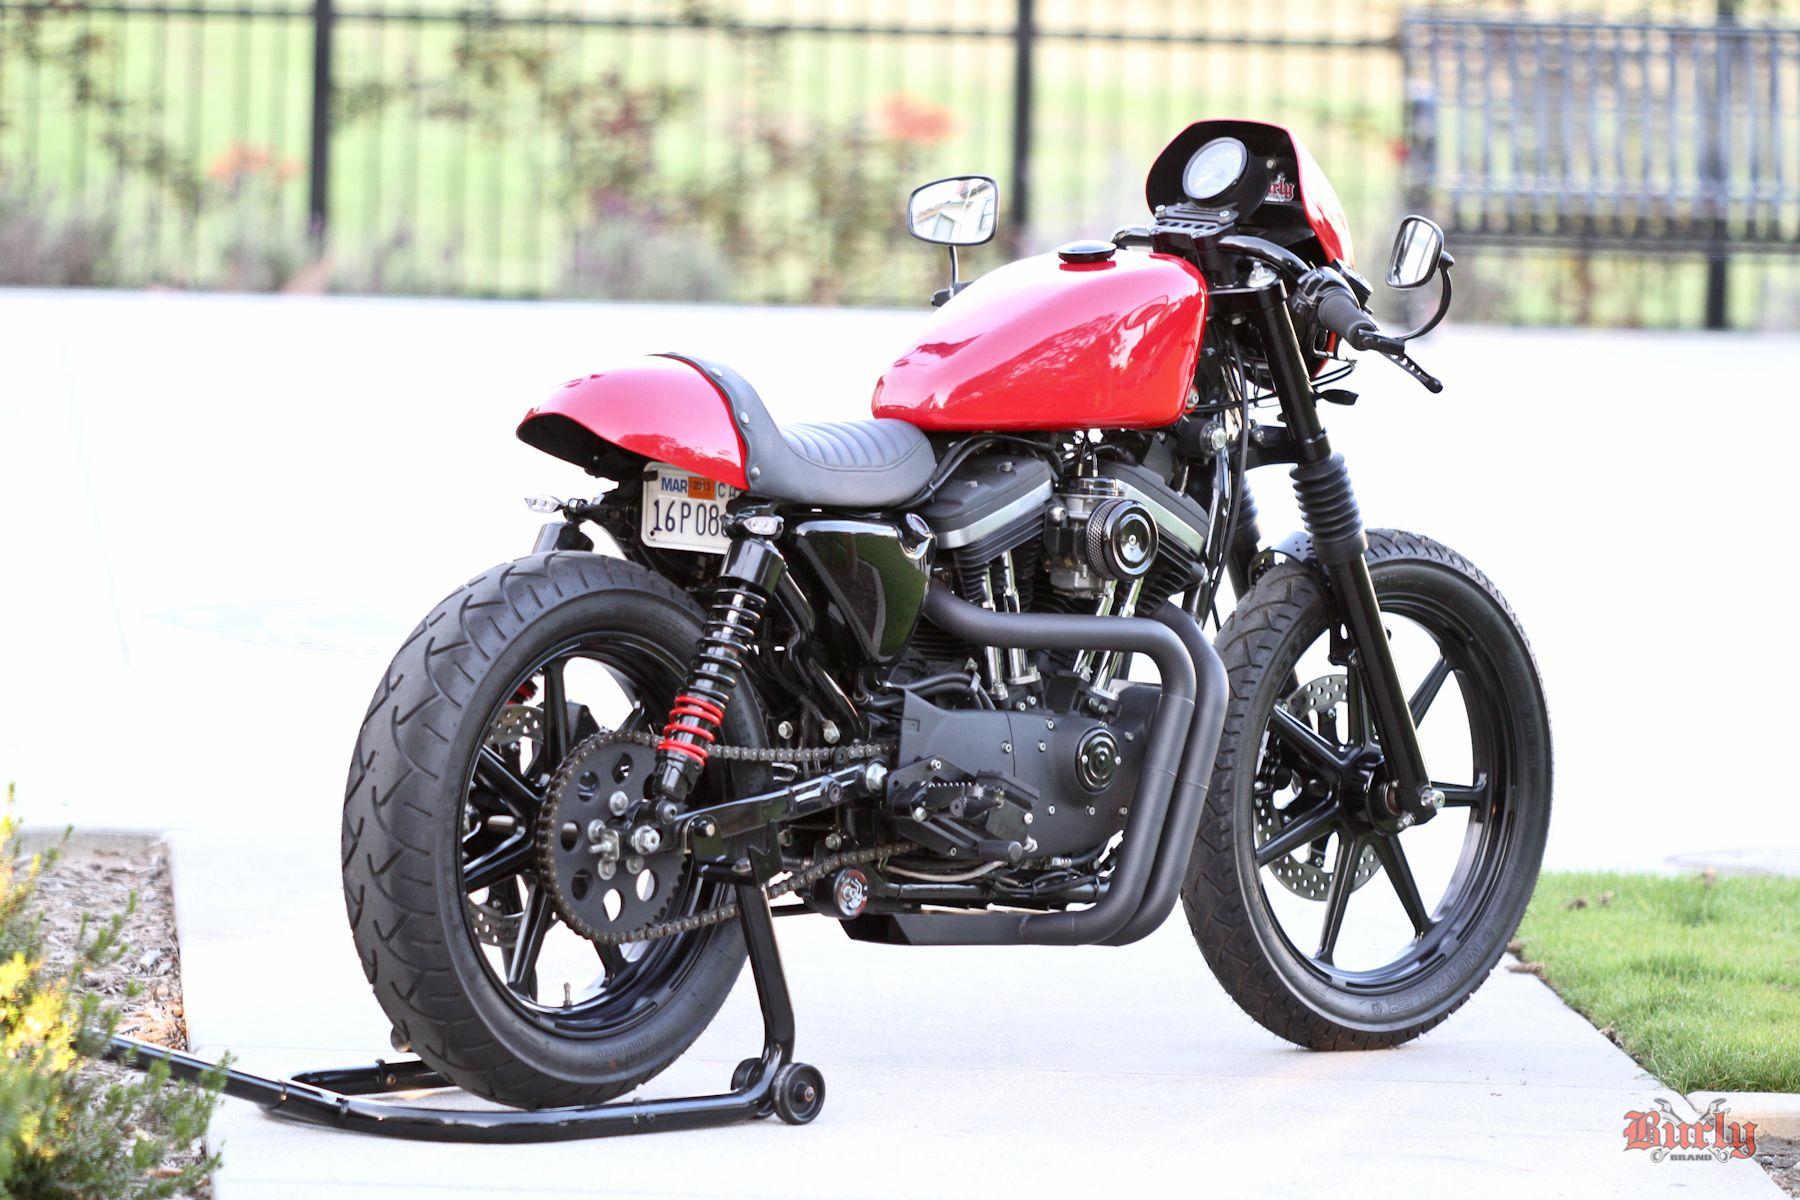 Cafe Tail Section Cafe Style Seat Burly Brand Harley Handlebars Cafe Racer Harley Davidson Sportster [ 1200 x 1800 Pixel ]